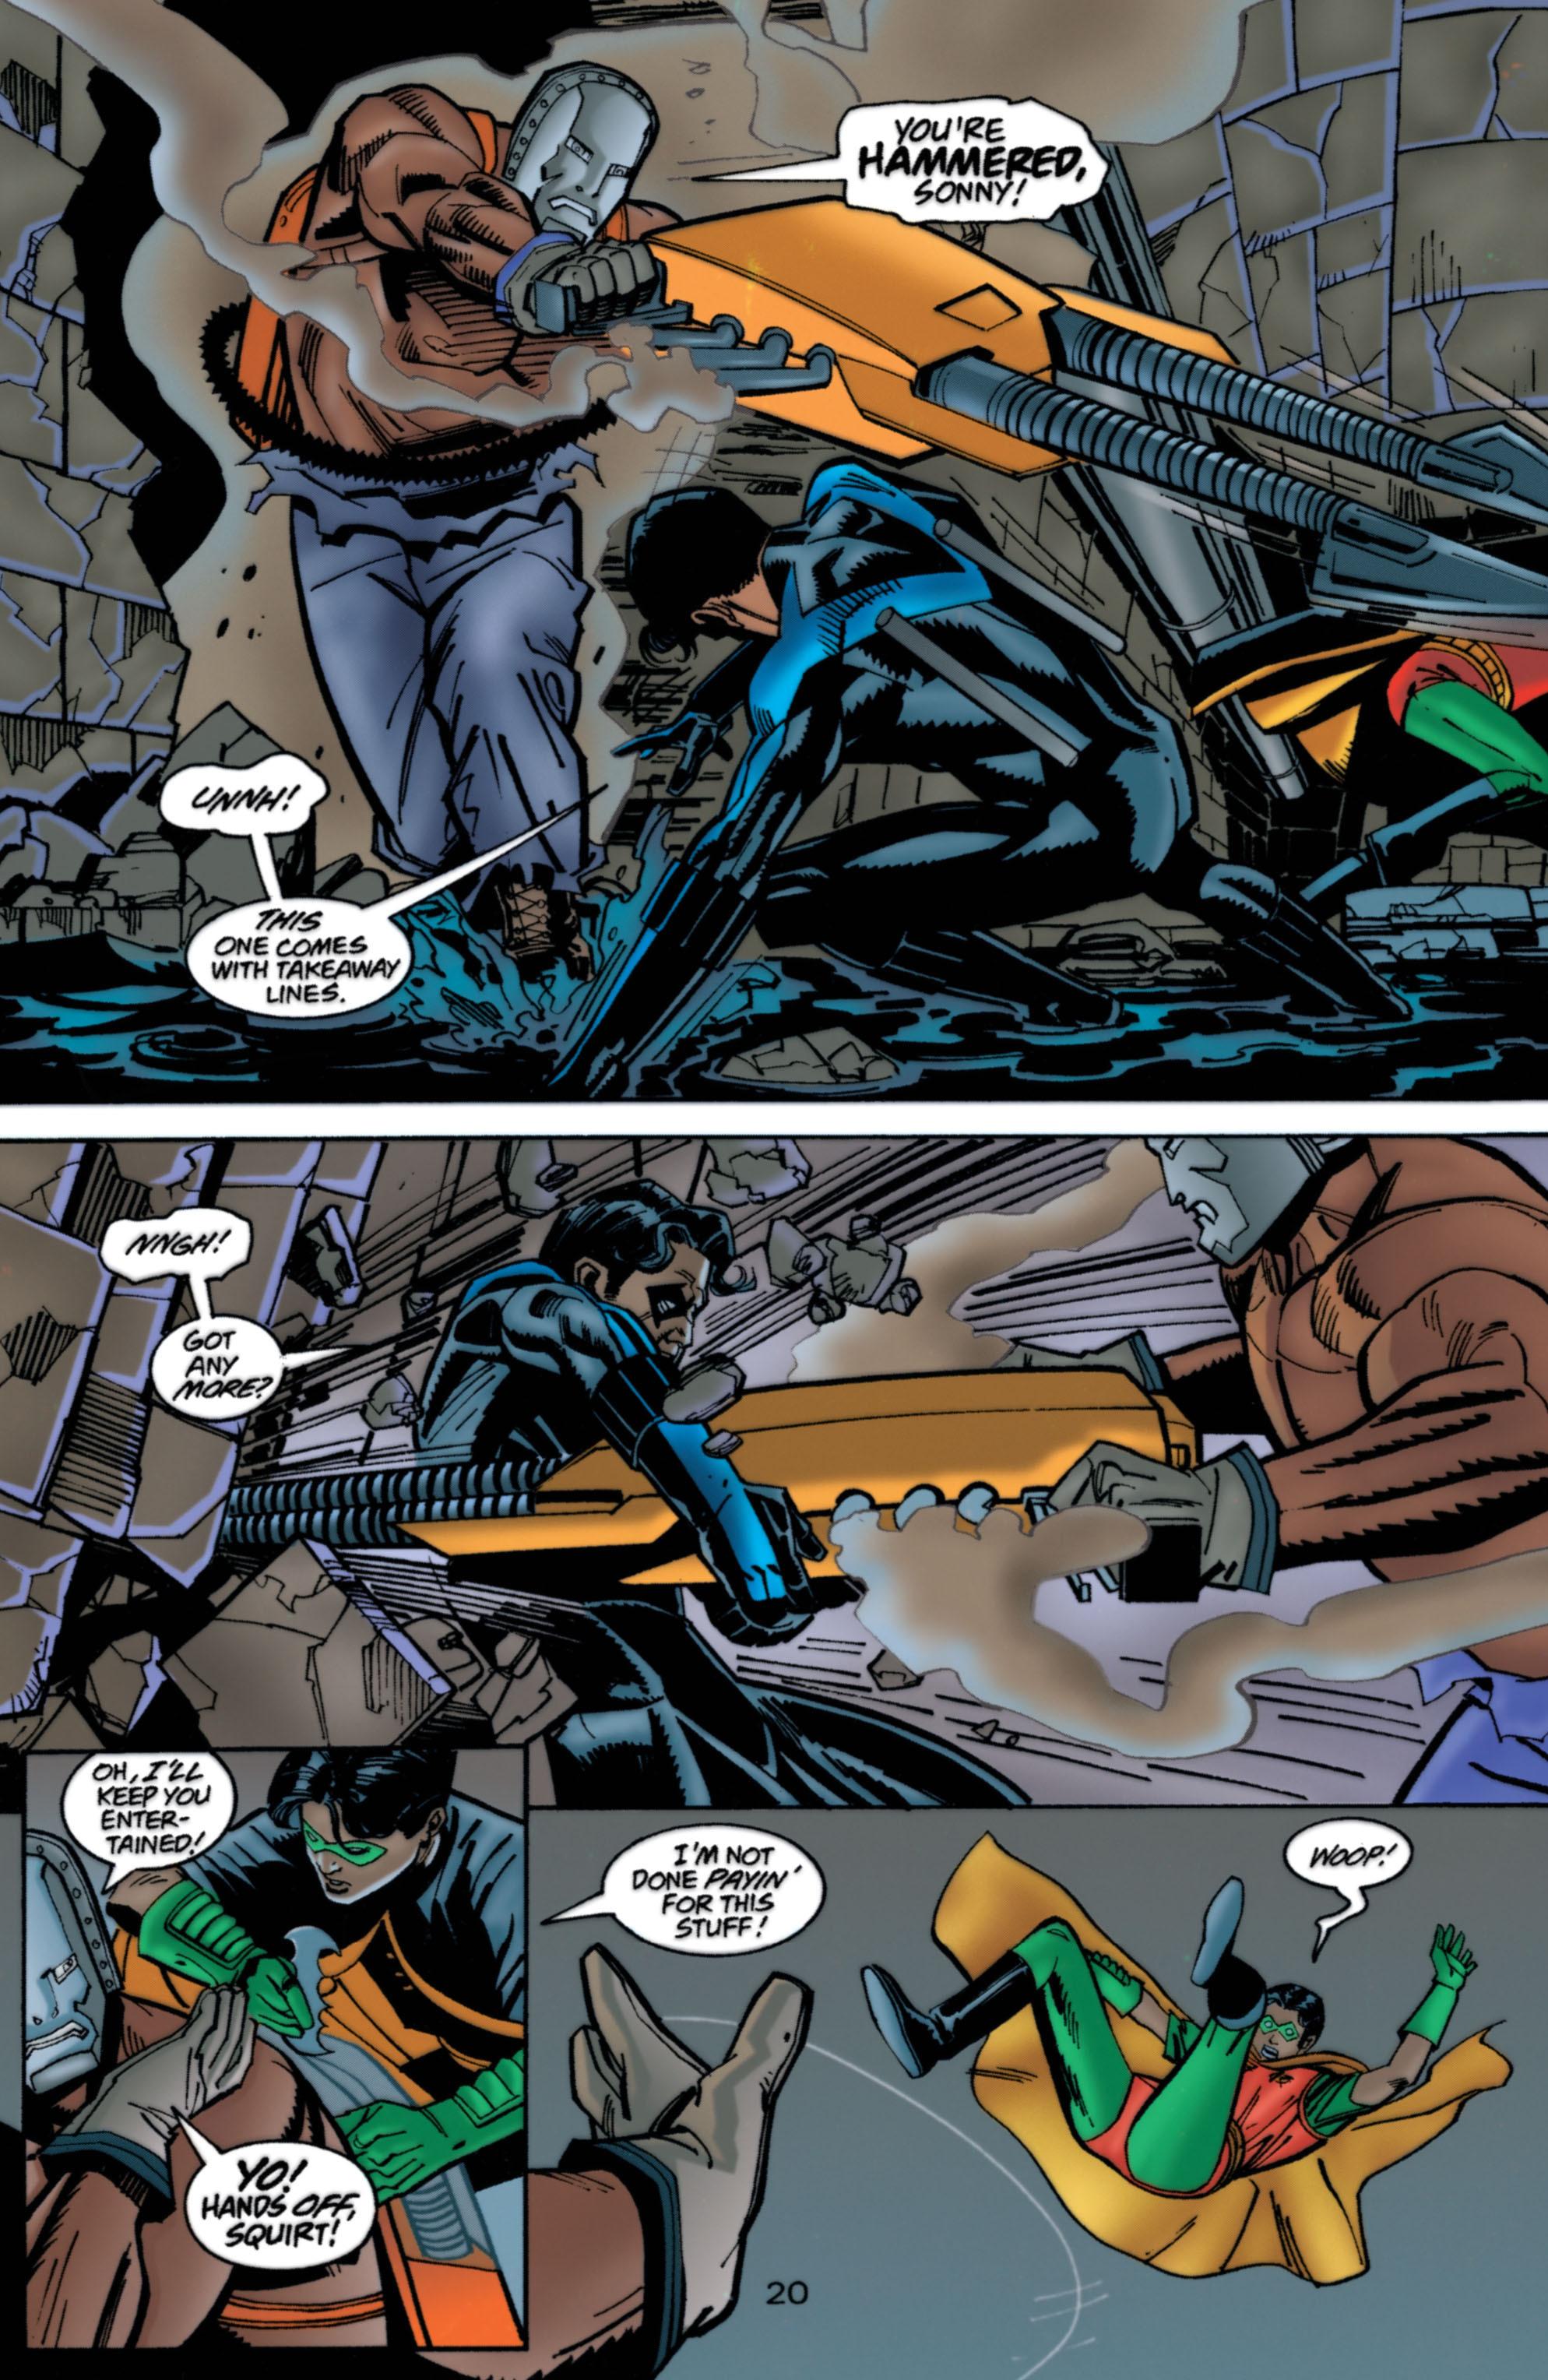 Detective Comics (1937) 728 Page 20